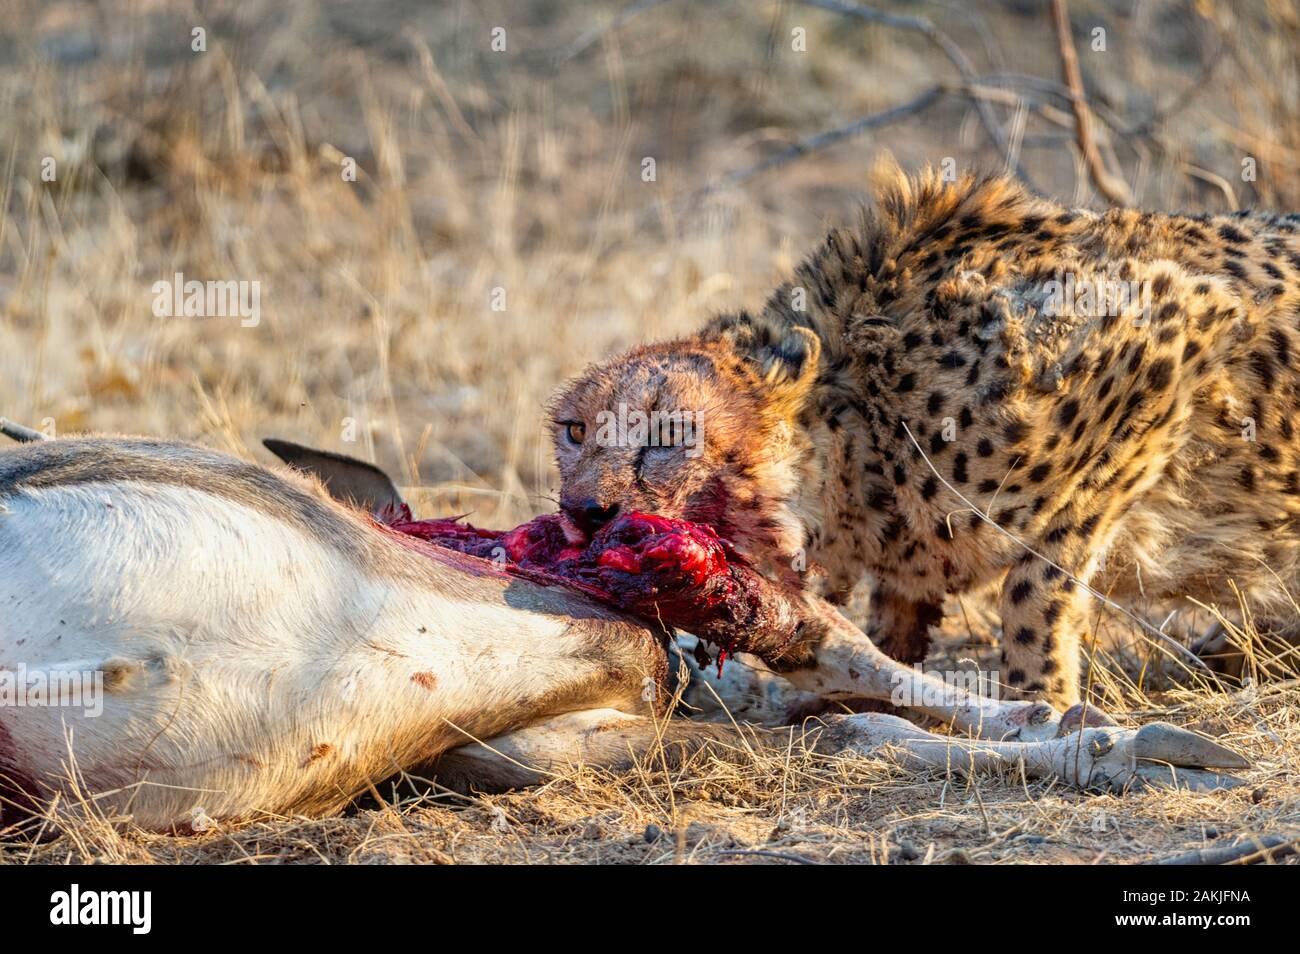 Namibia, Afrika. Geparden jagen Oryx auf Okonjima finden Stockfoto